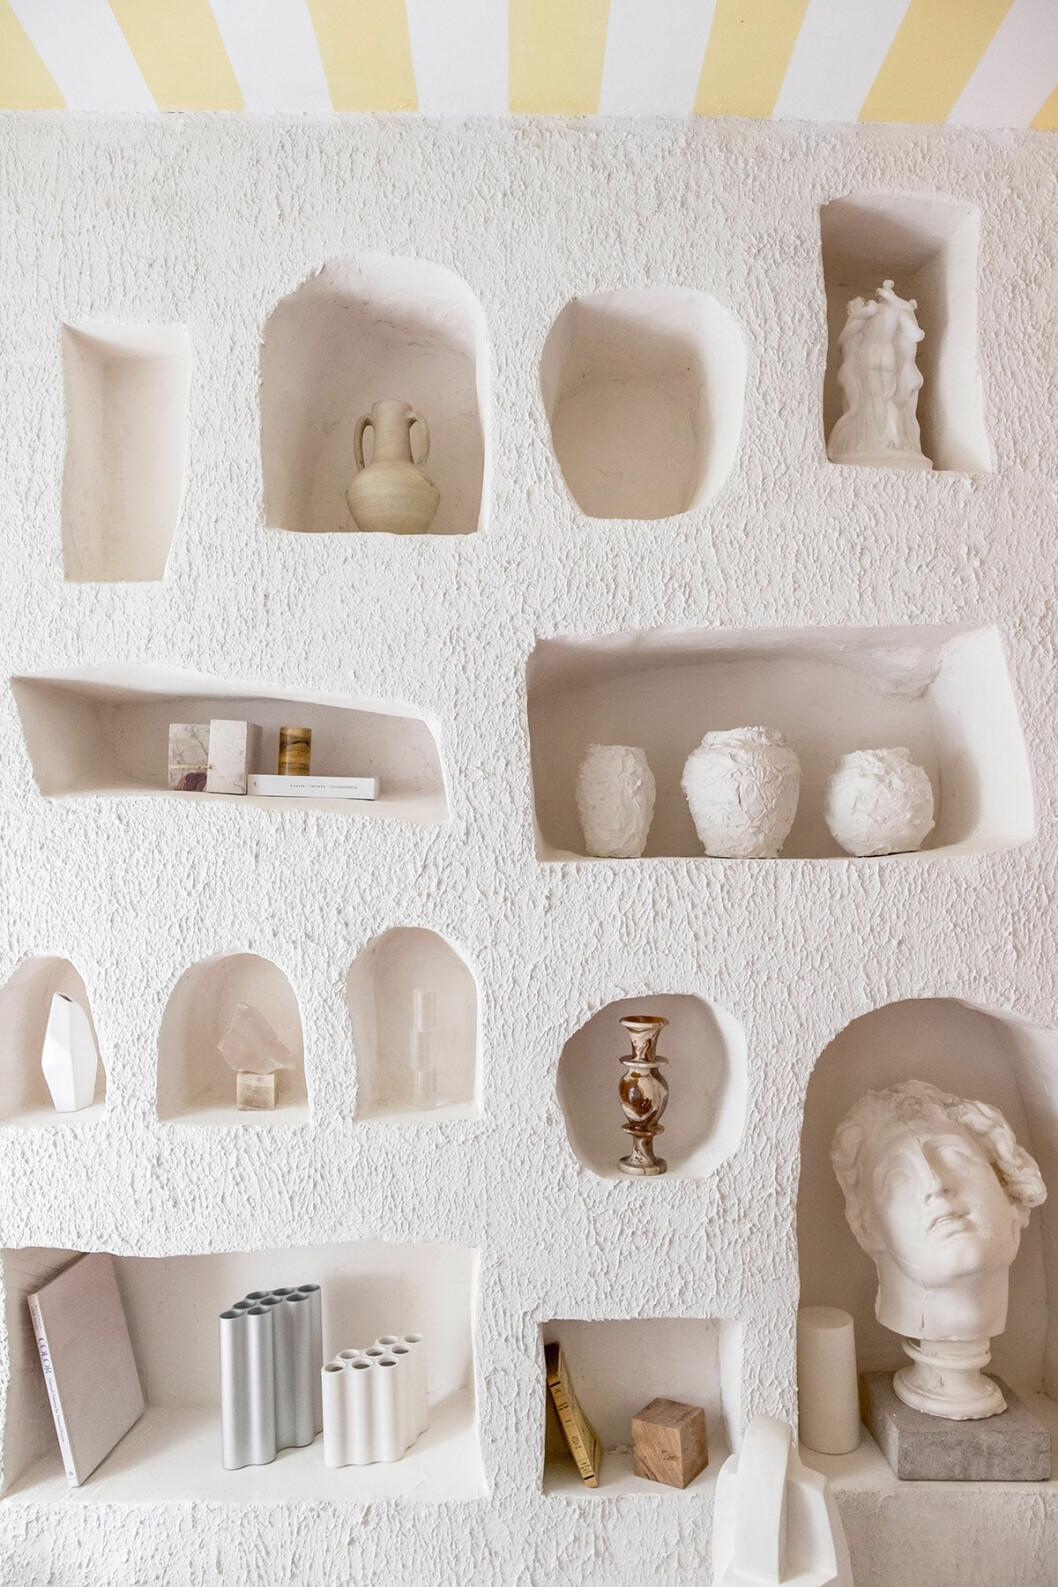 hylla inspirerad av grotta av Studio Haddou Dufourcq